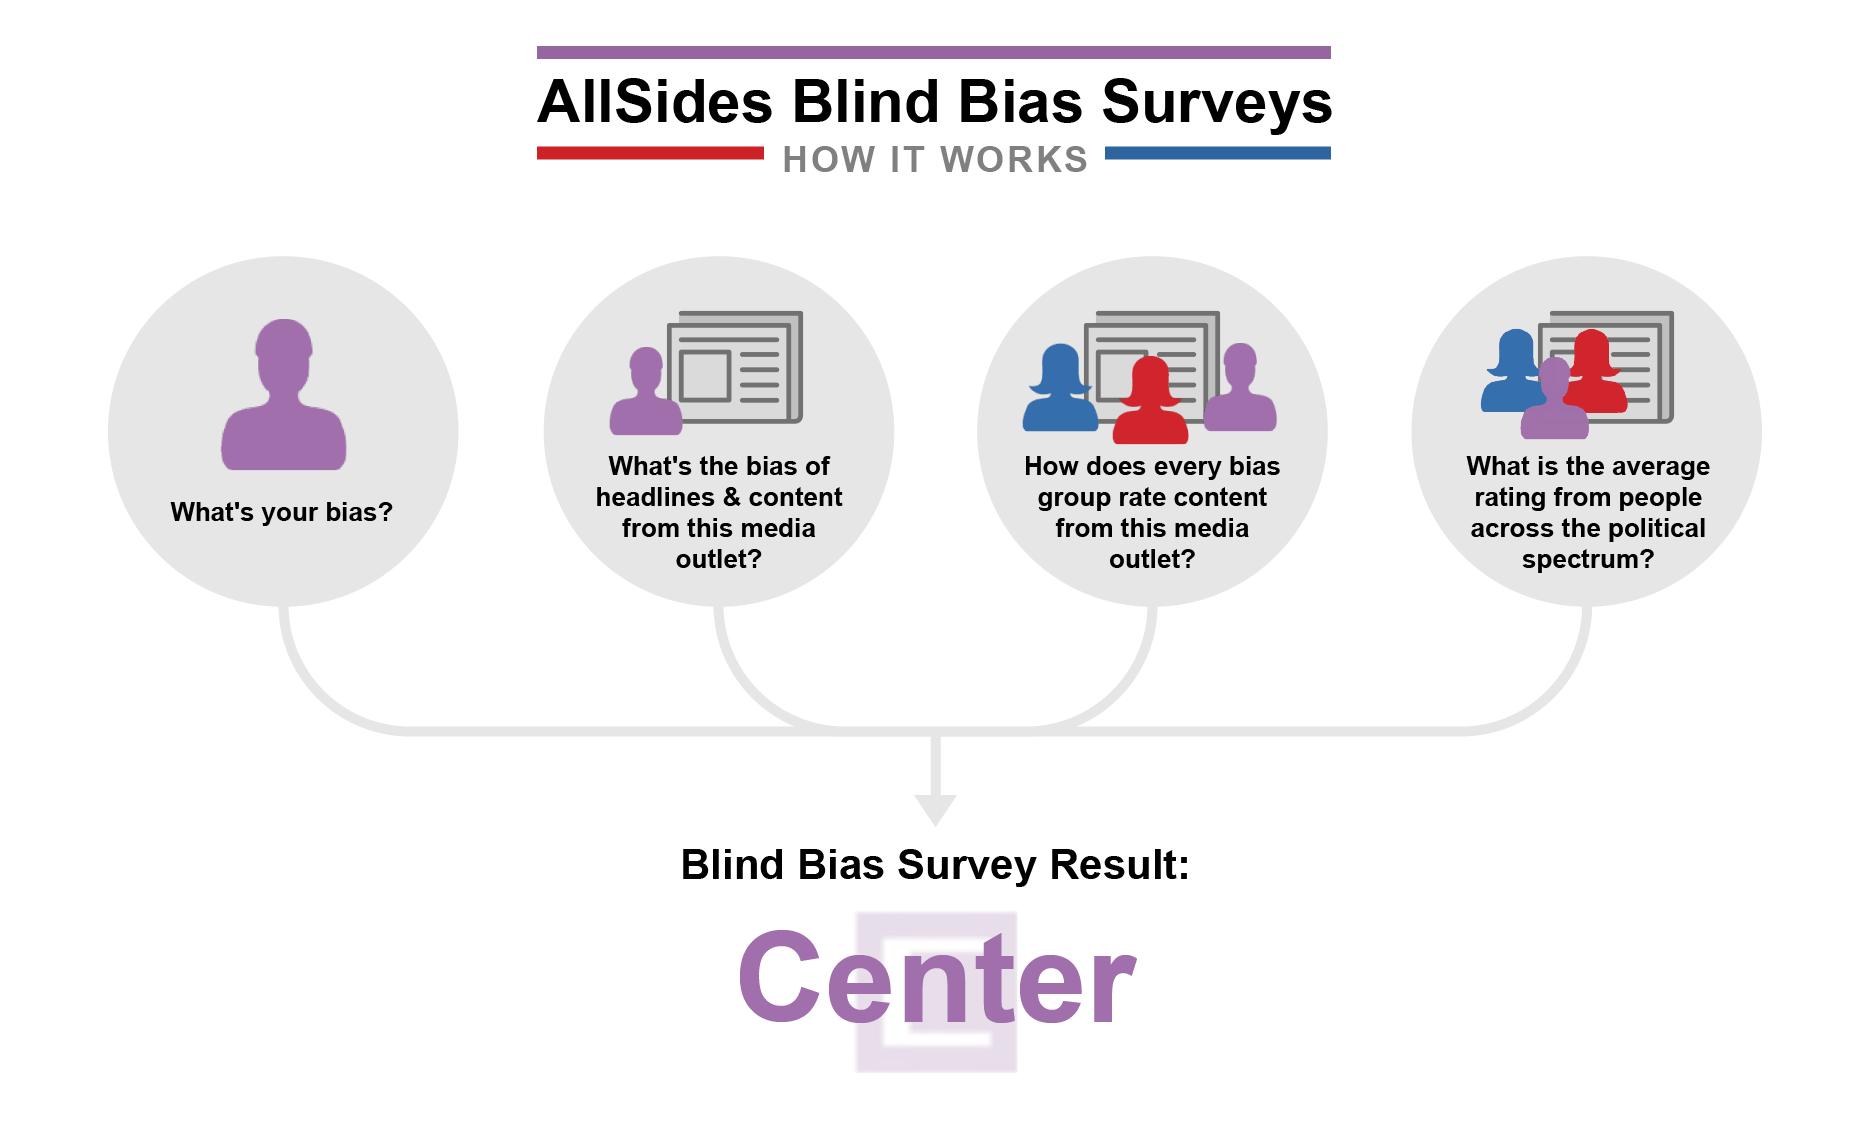 About AllSides Blind Bias Surveys